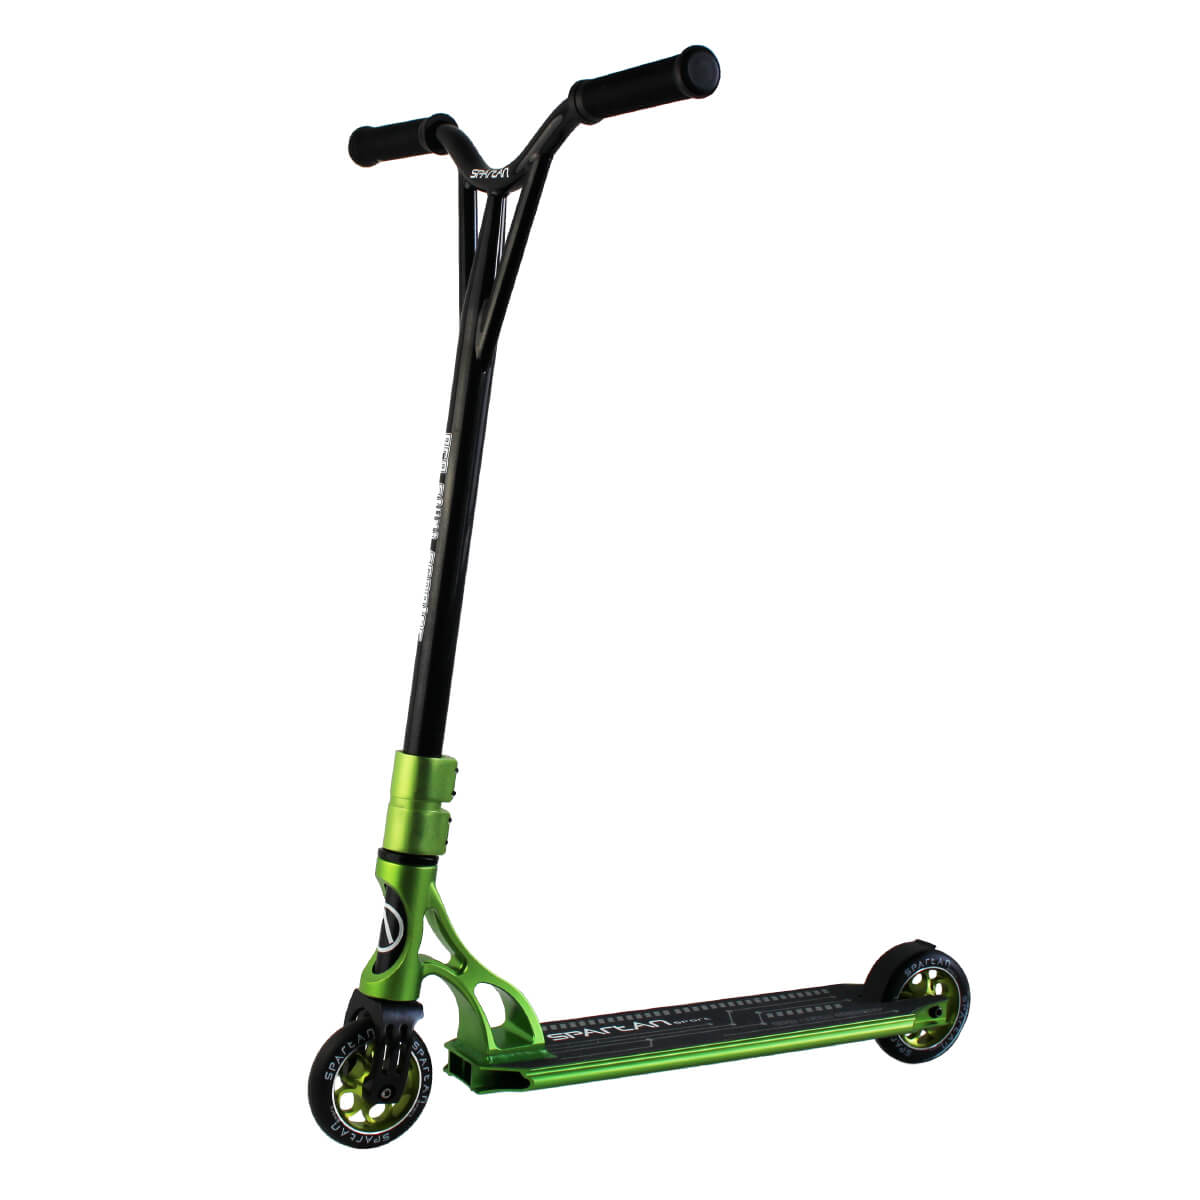 SPARTAN Stunt Pro High Level S2300 zeleno-čierna